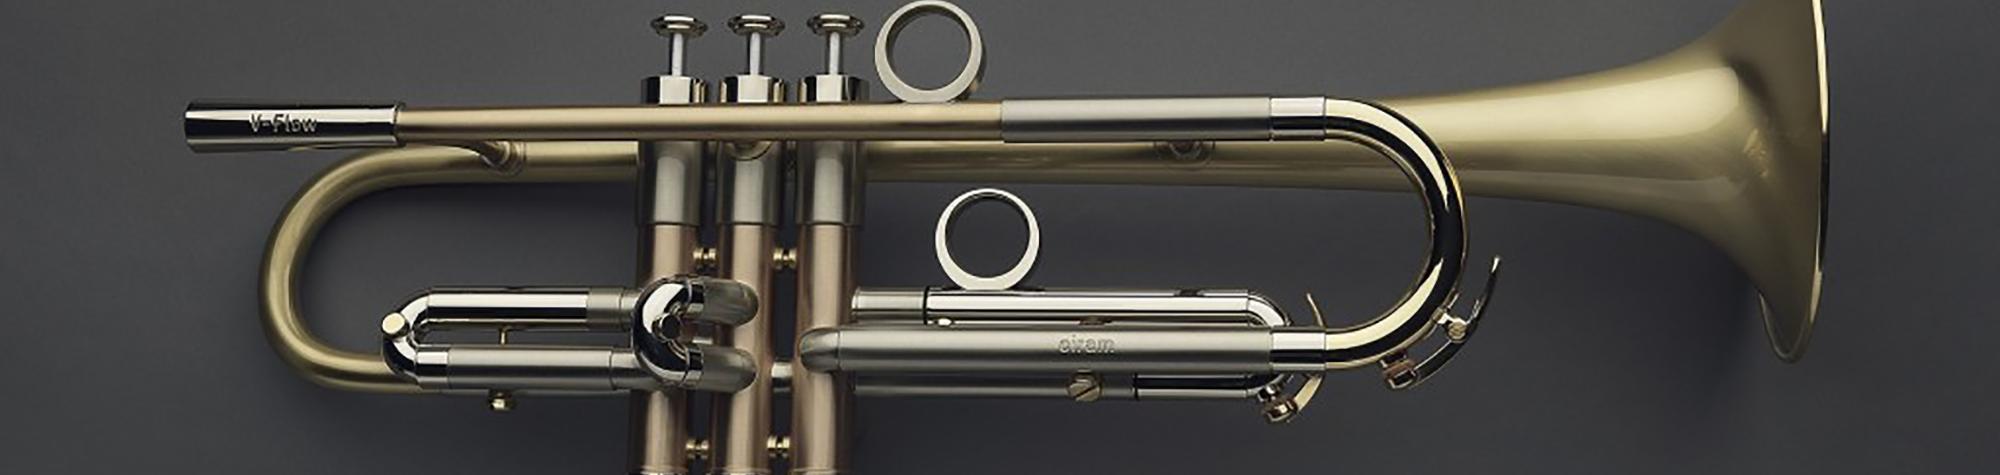 Hub van Laar Trumpet Interview – The Other Side of the Bell #66